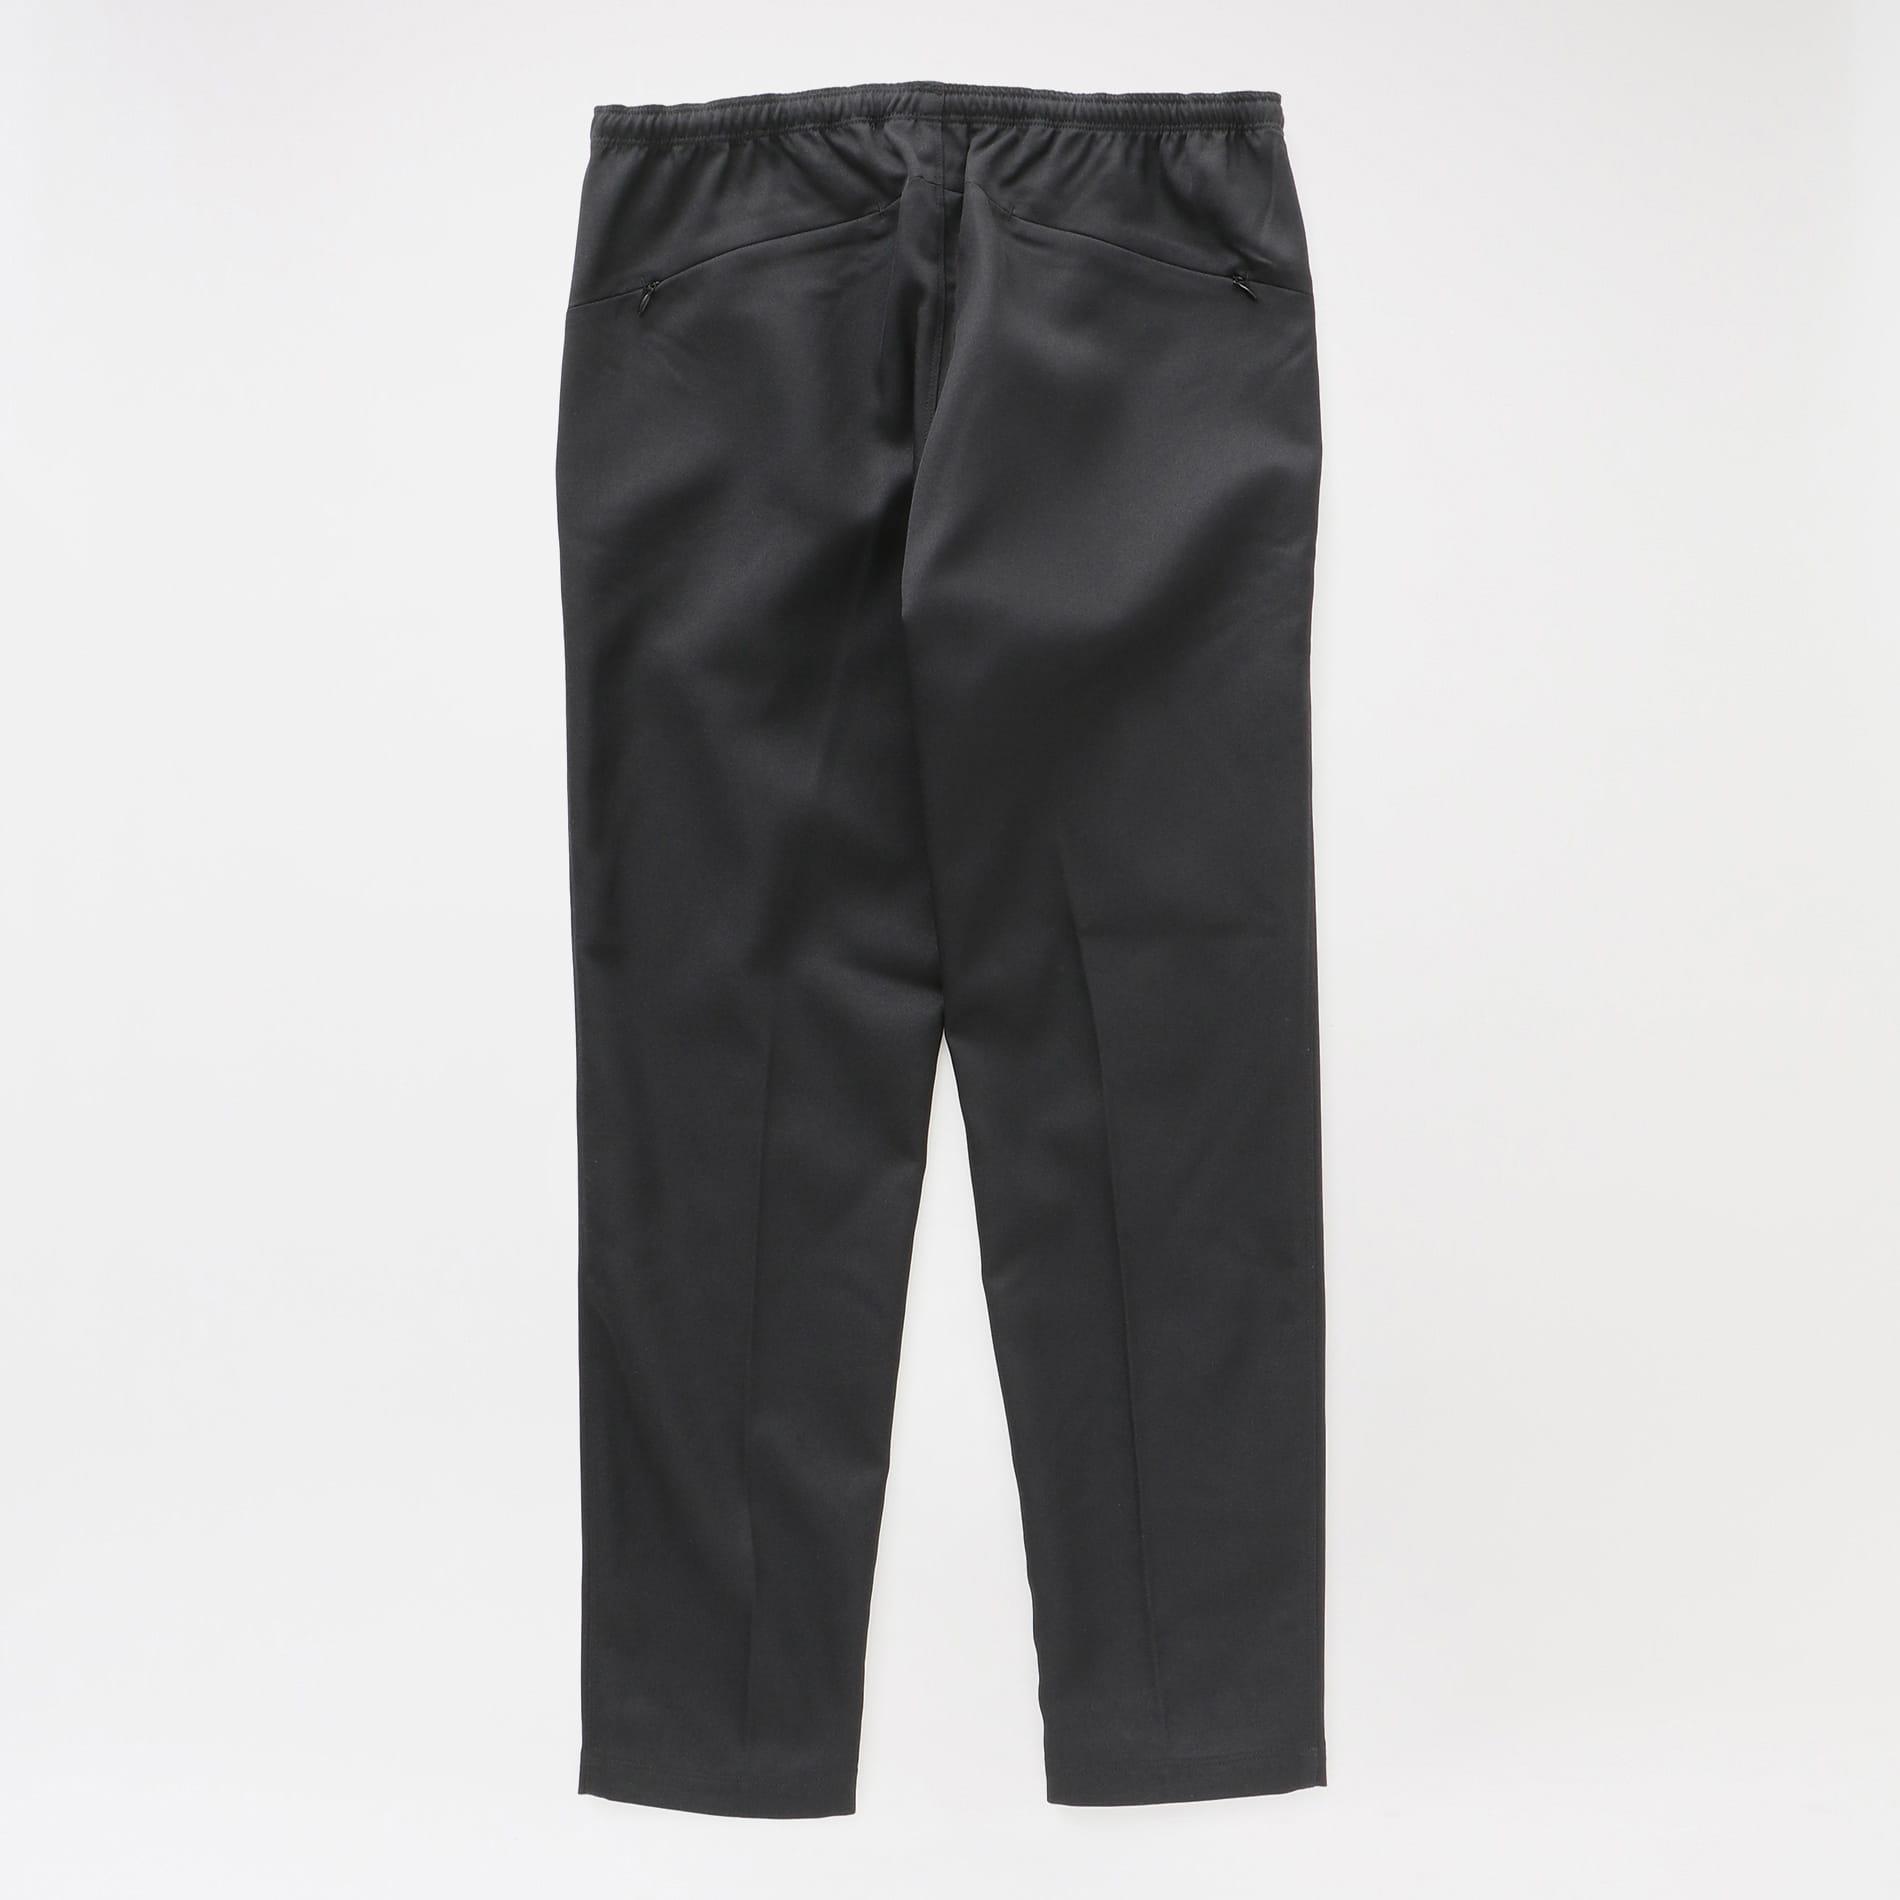 【Needles】MEN パンツ W.U. Pant - Pe/C Twill IN153